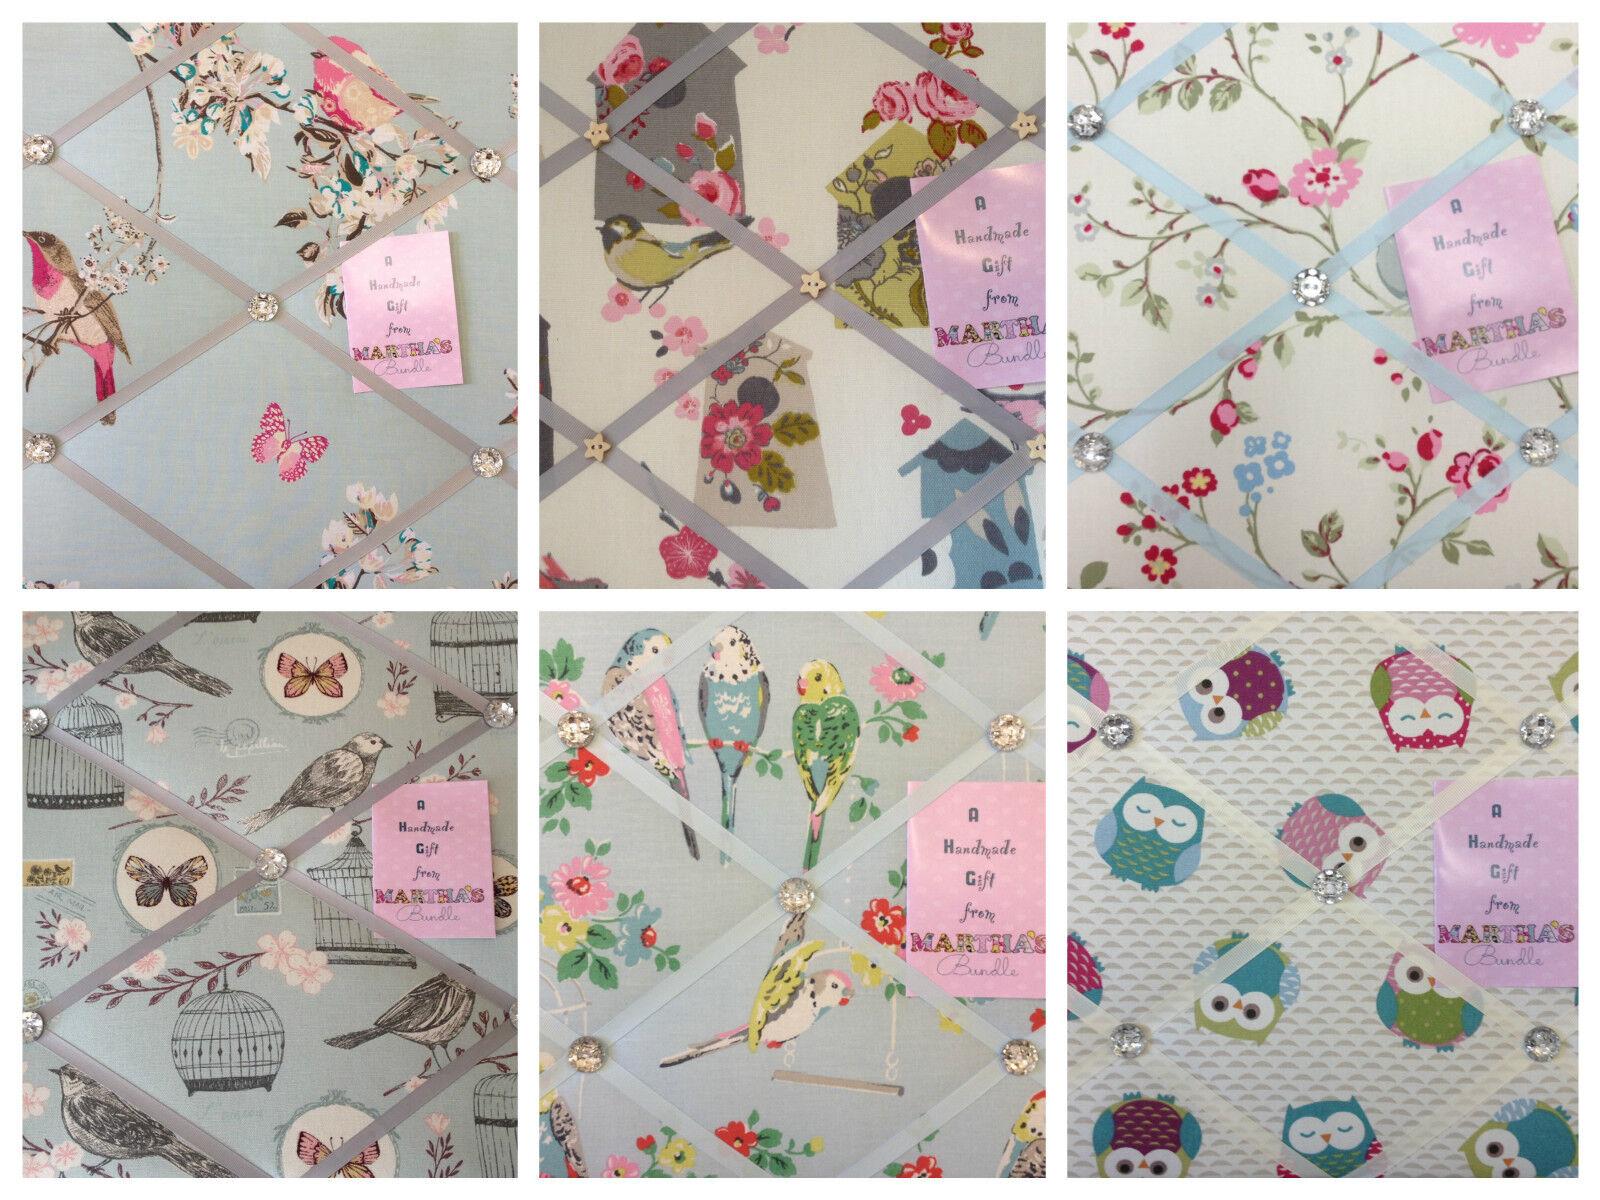 Birds Handmade Pin memo Notice Photo board Gift Bettroom choice fabrics Handmade